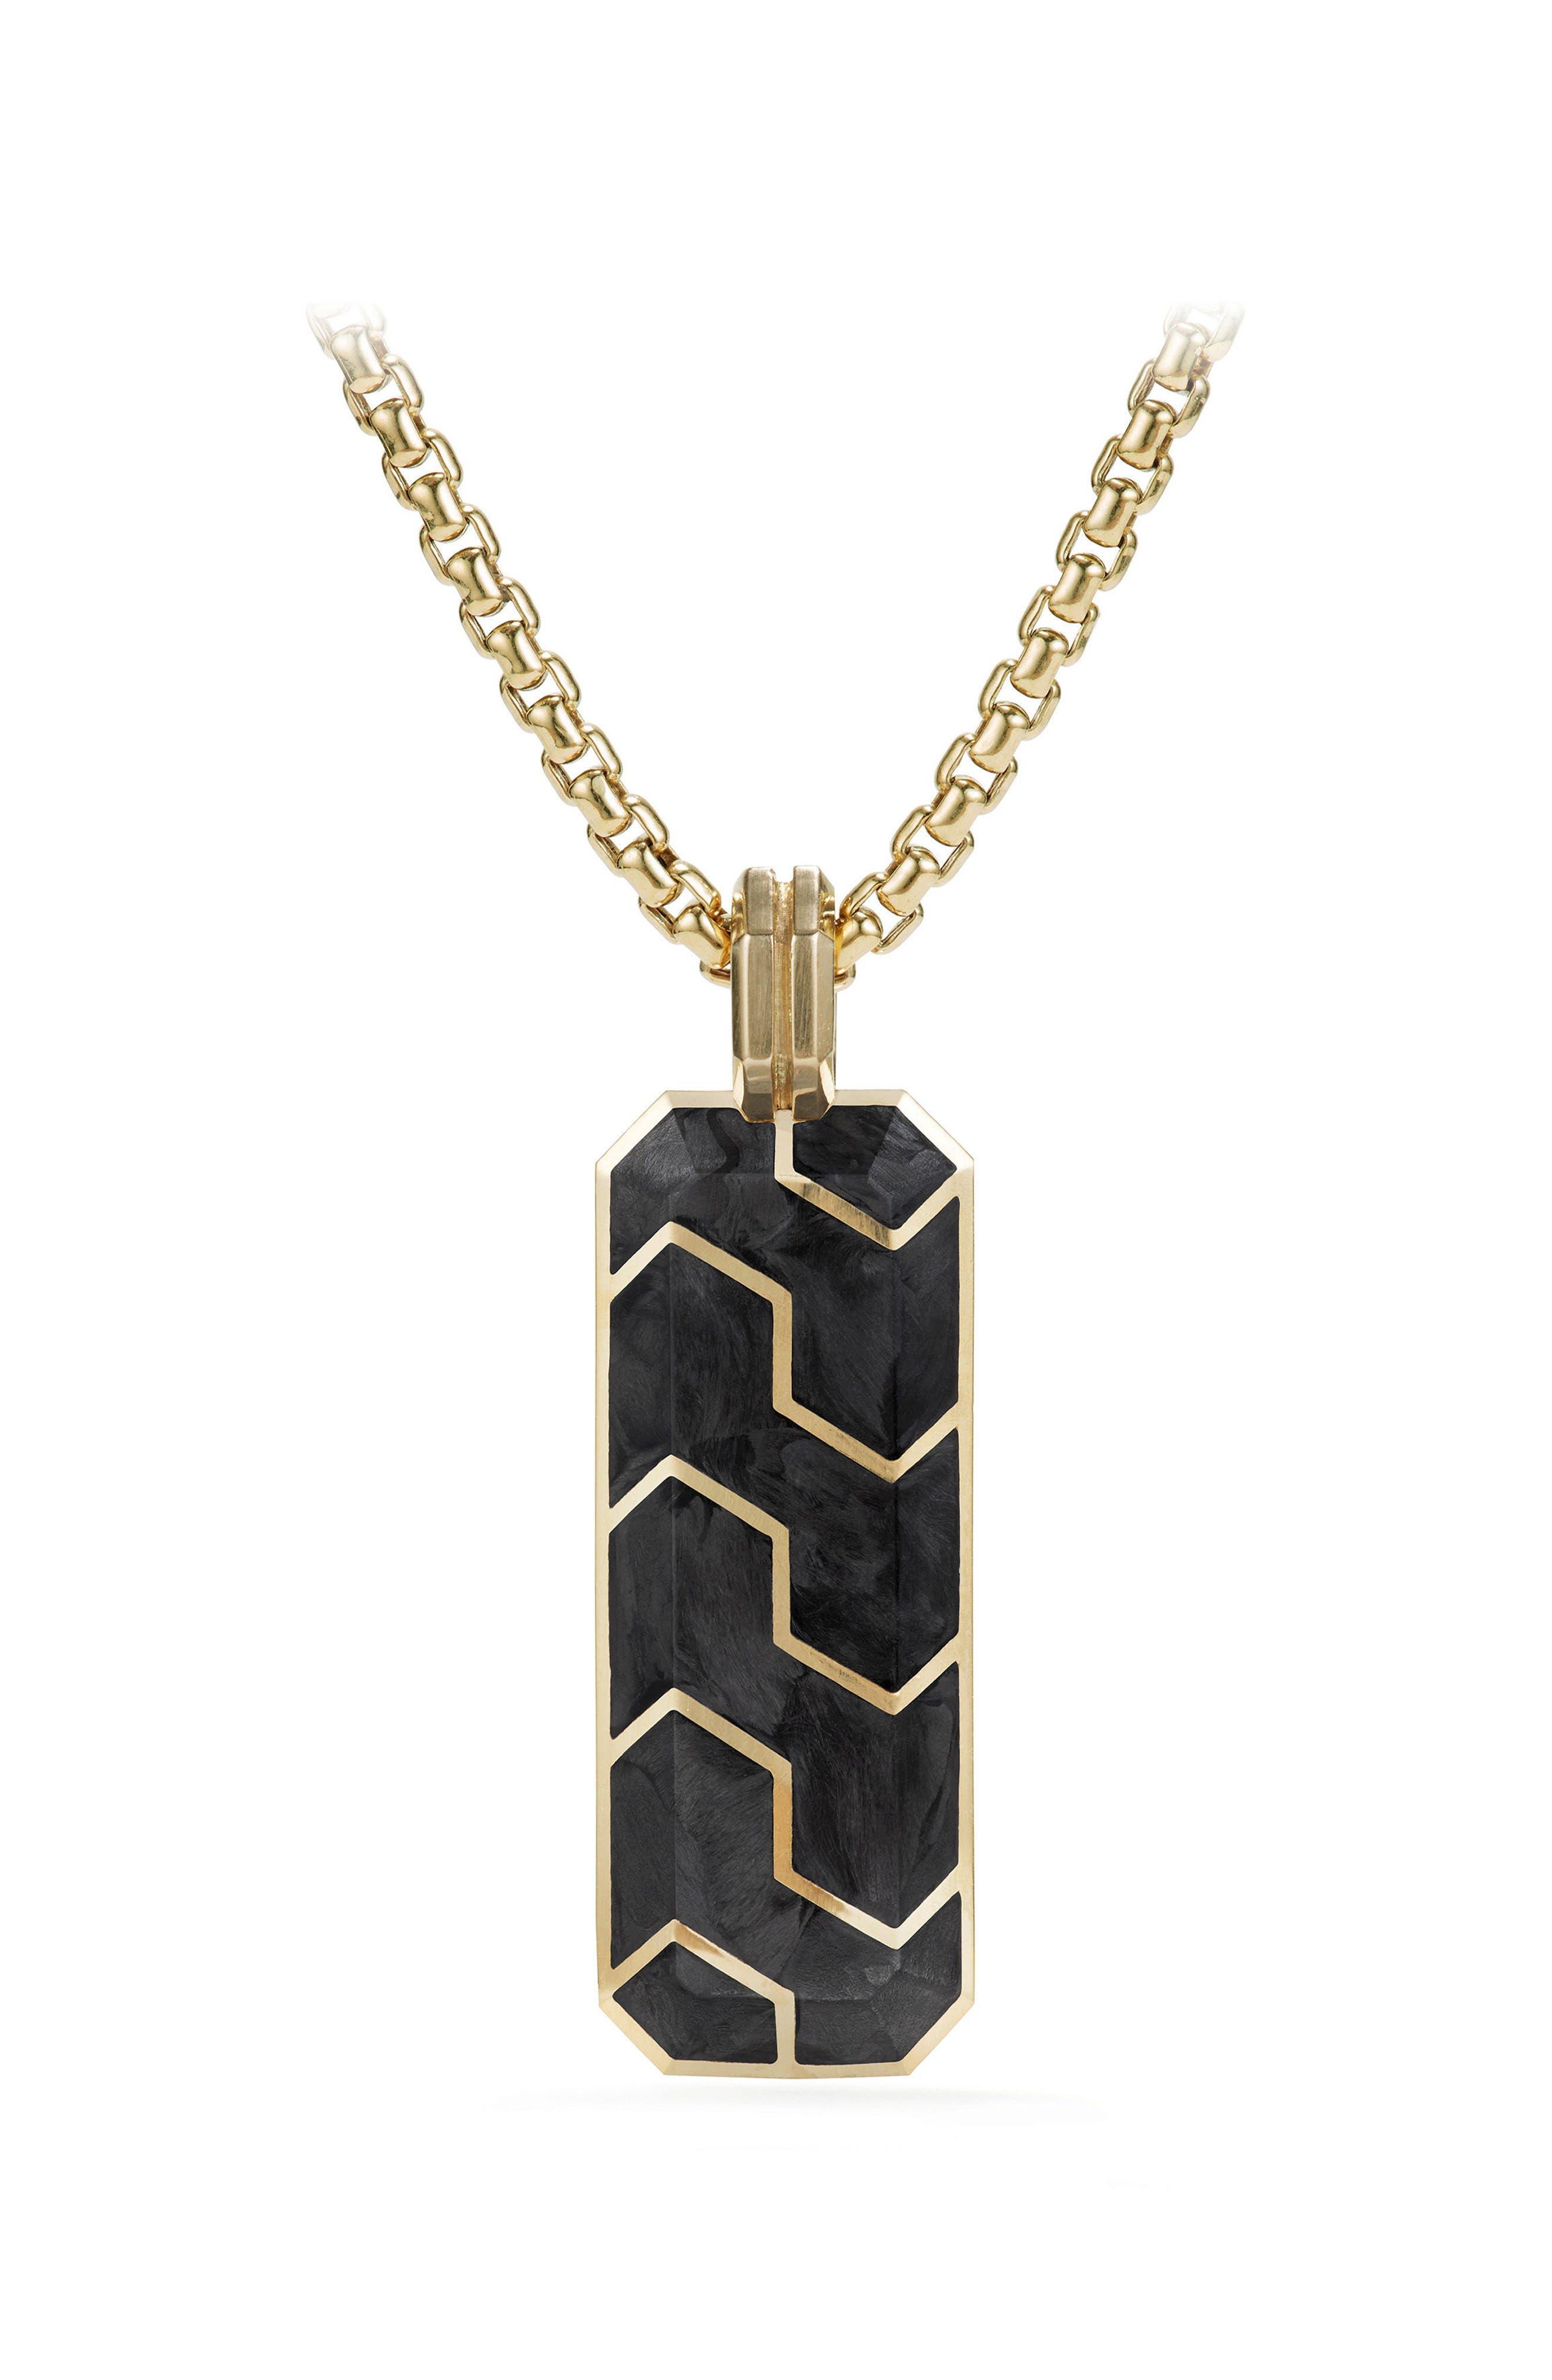 Davdi Yurman Forged Carbon Ingot Tag with 18K Gold,                             Main thumbnail 1, color,                             020